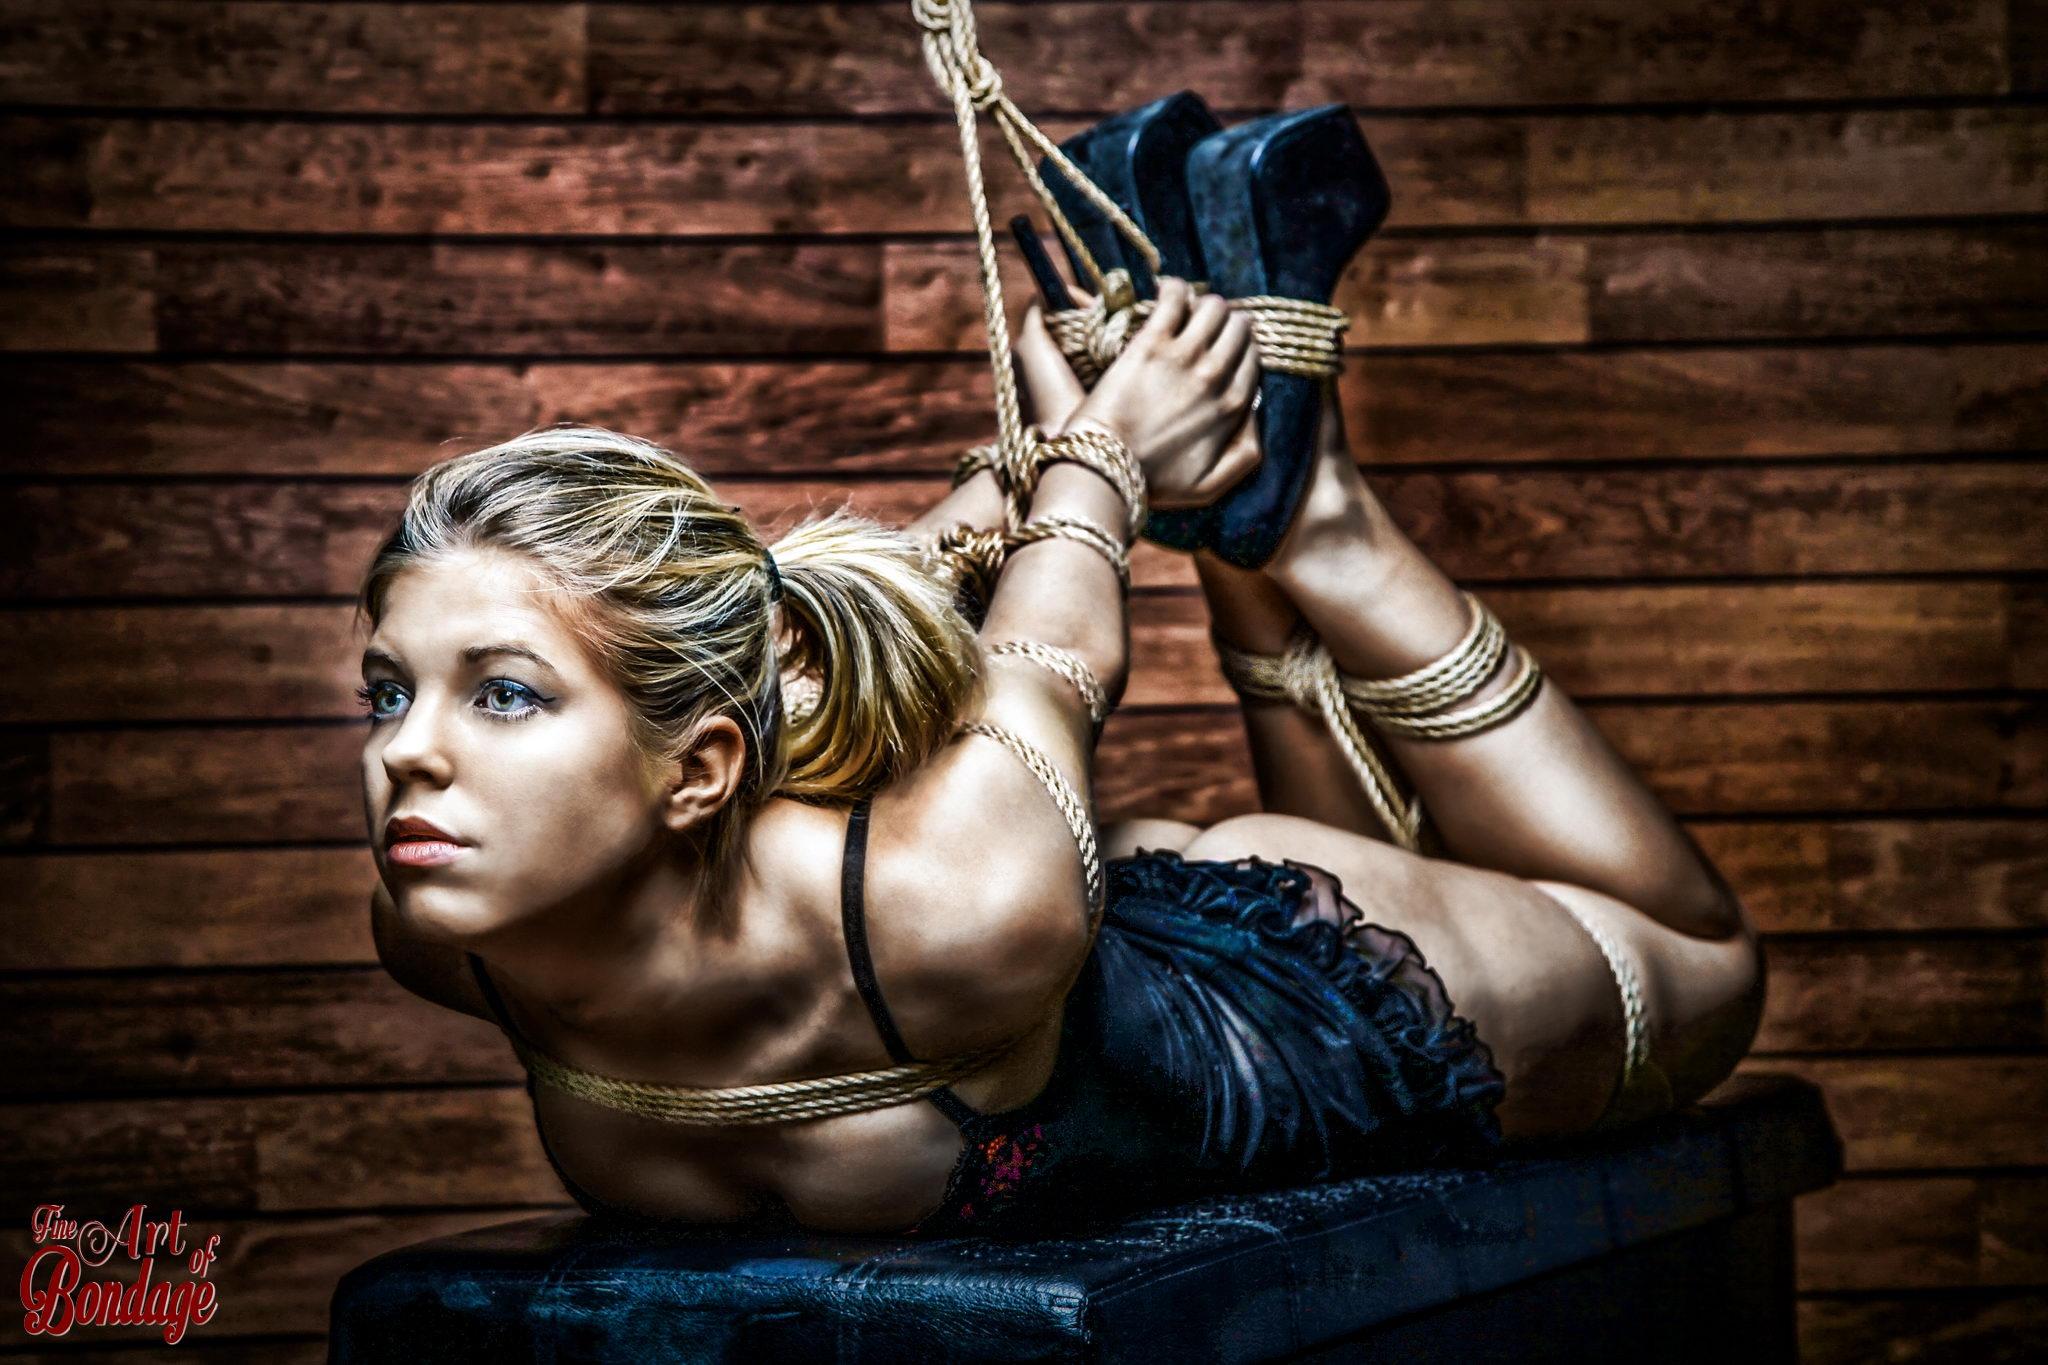 4624 - Hogtie - Tied up girl